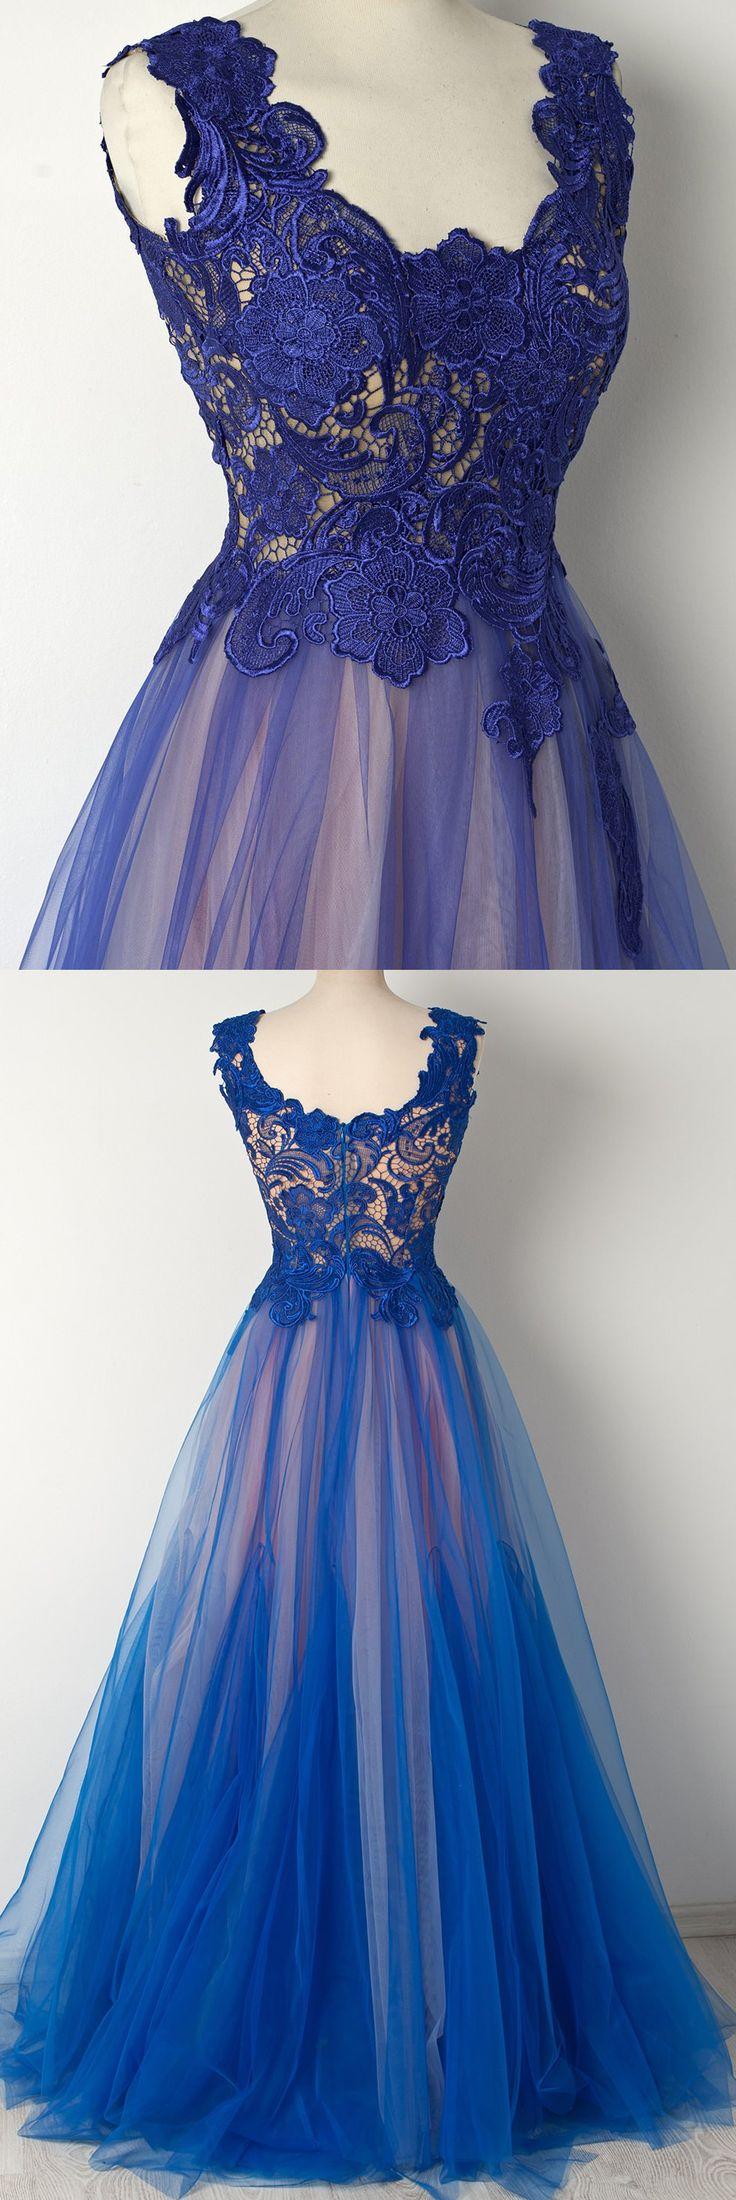 best prom dress images on pinterest prom dresses long prom